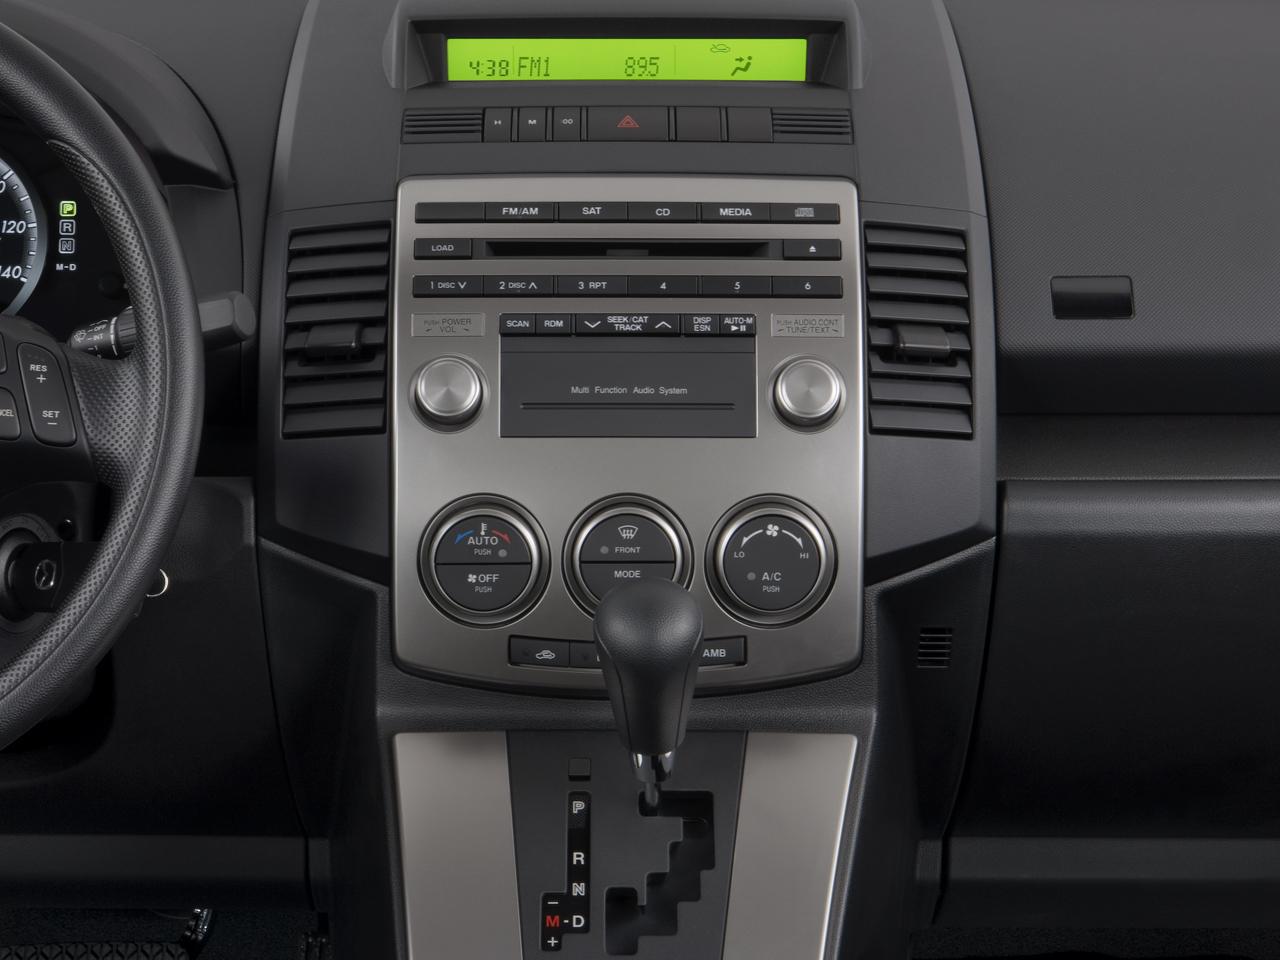 http://st.automobilemag.com/uploads/sites/10/2015/11/2008-mazda-mazda5-sport-wagon-instrument-panel.png